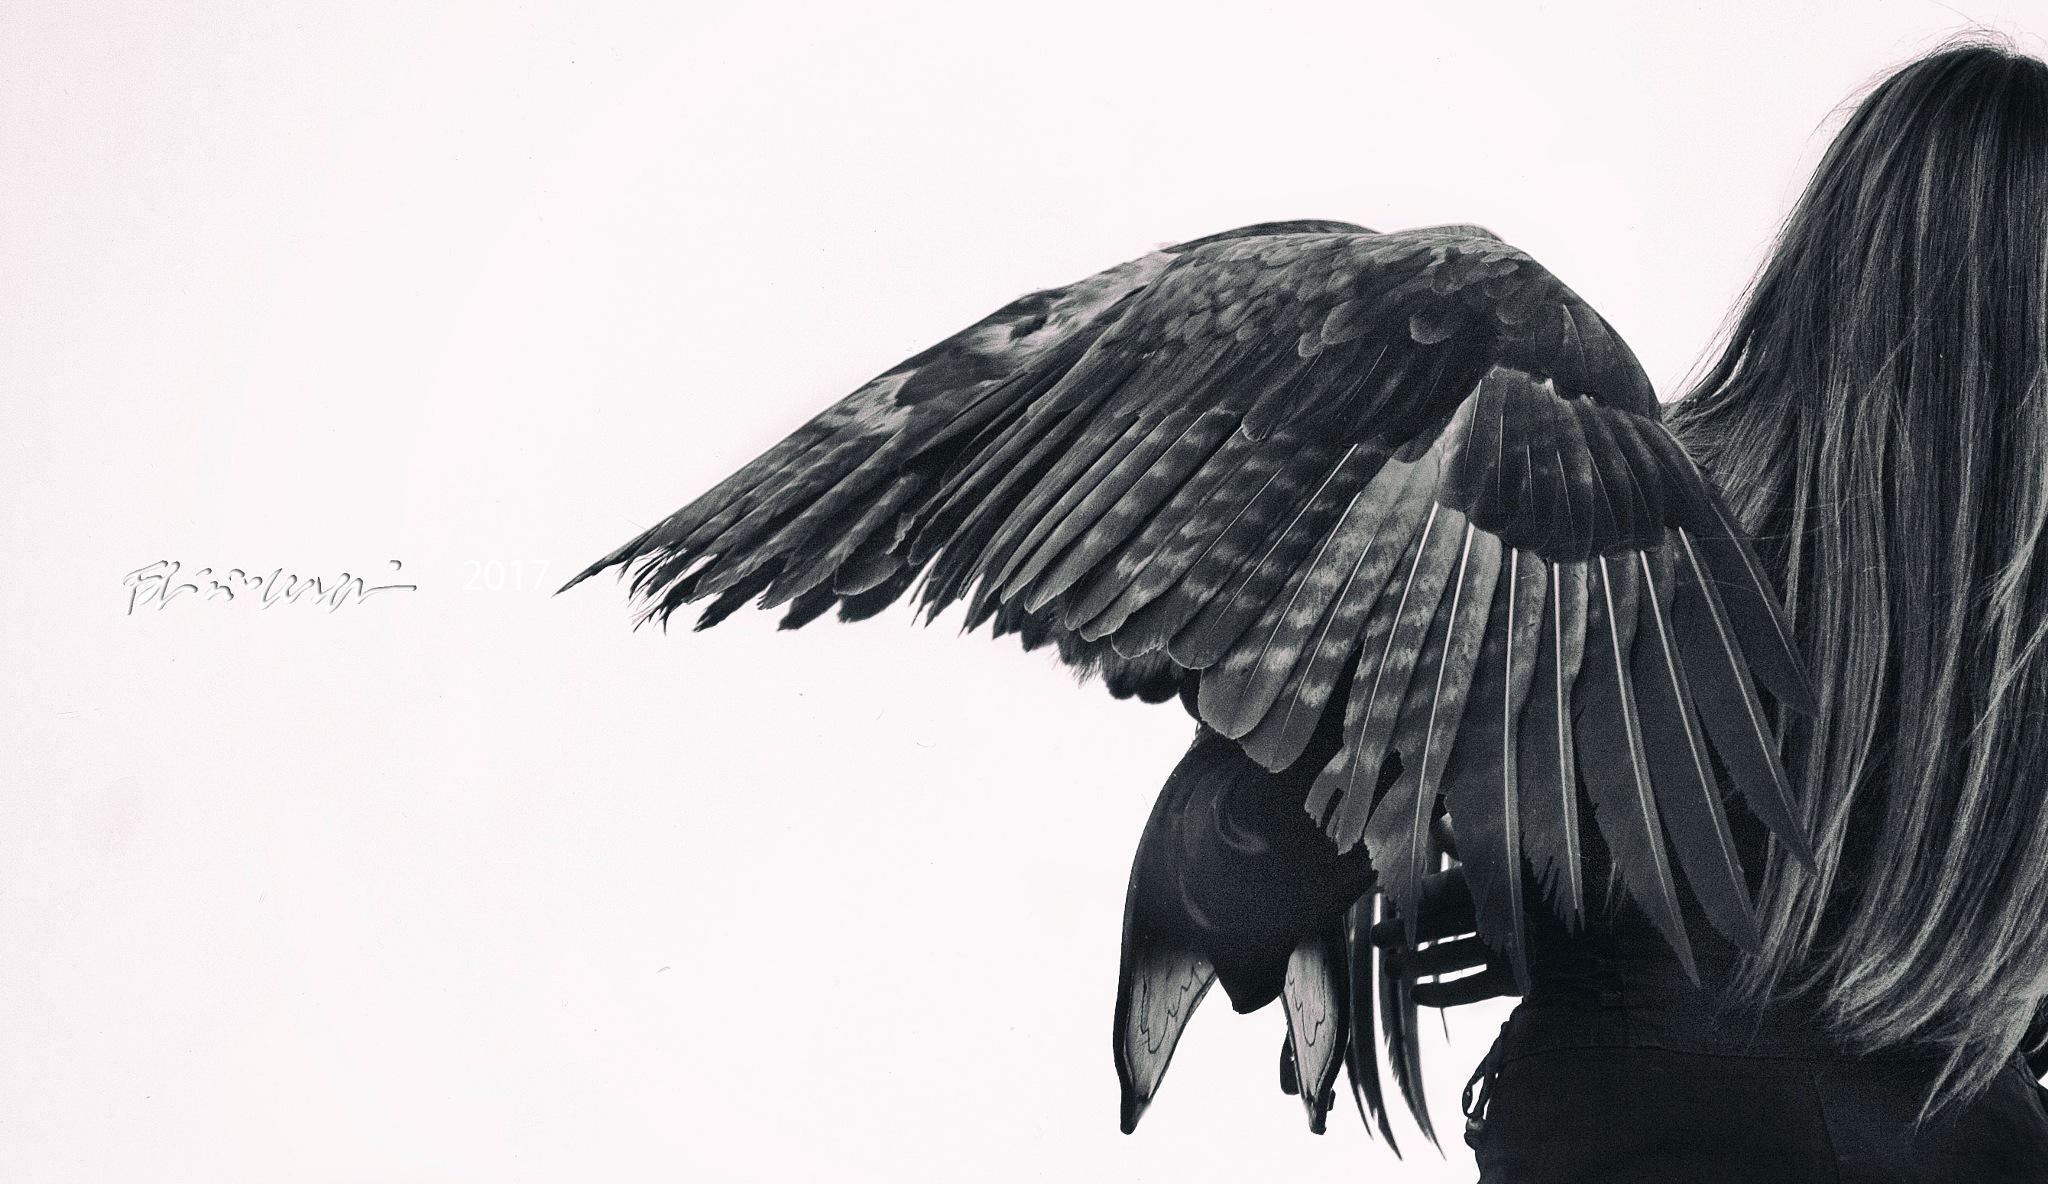 Angels by Fabrizio Cesari